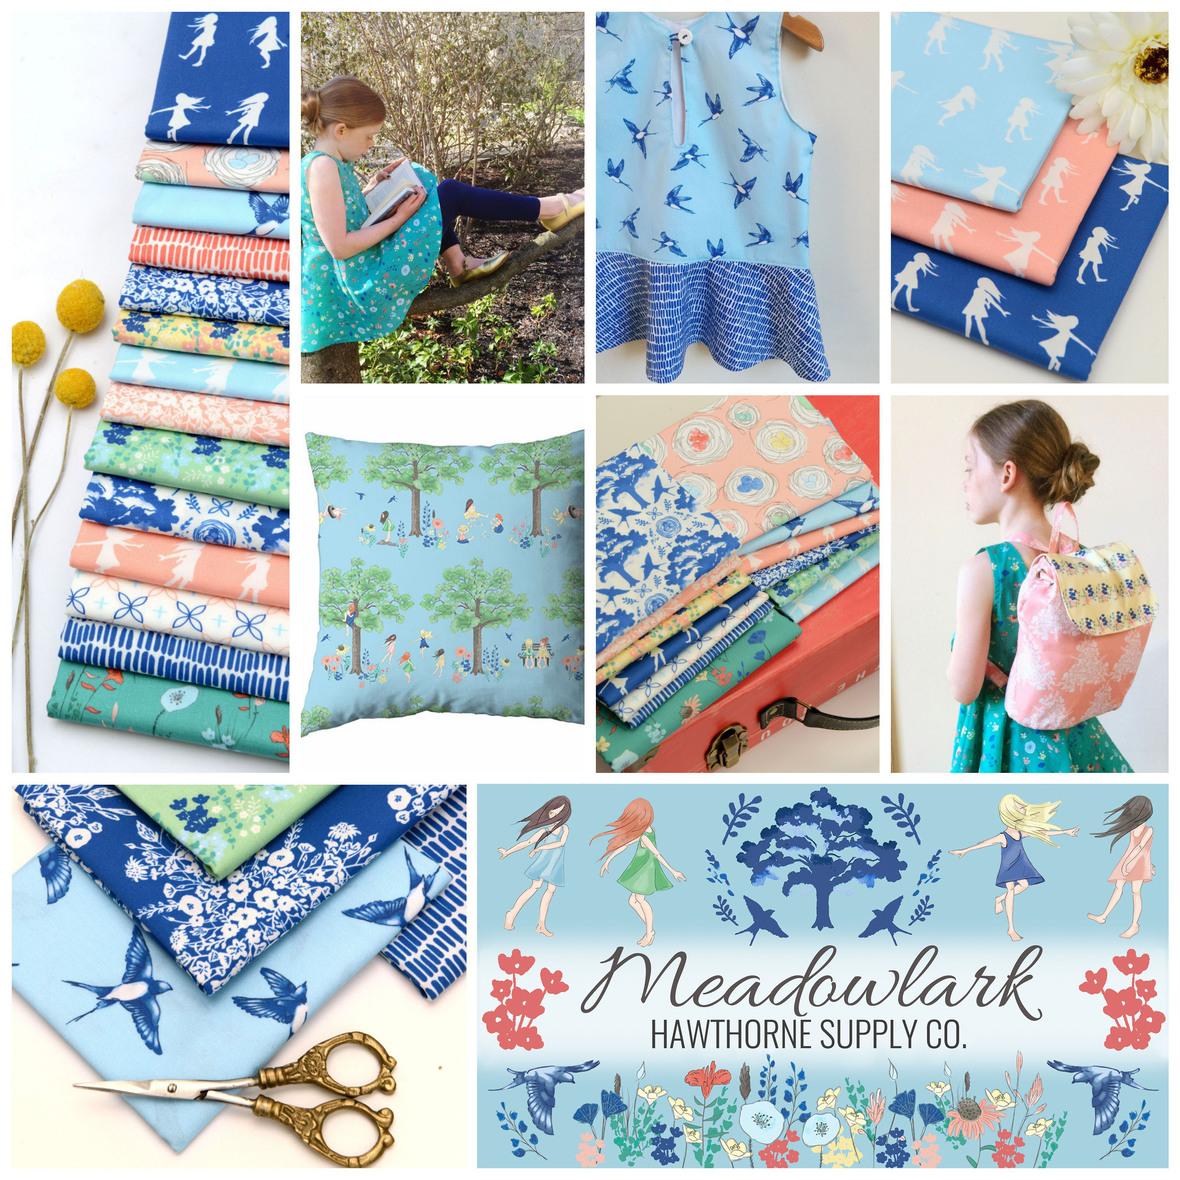 Meadowlark Fabric Hawthorne Threads Poster 2800 - Copy